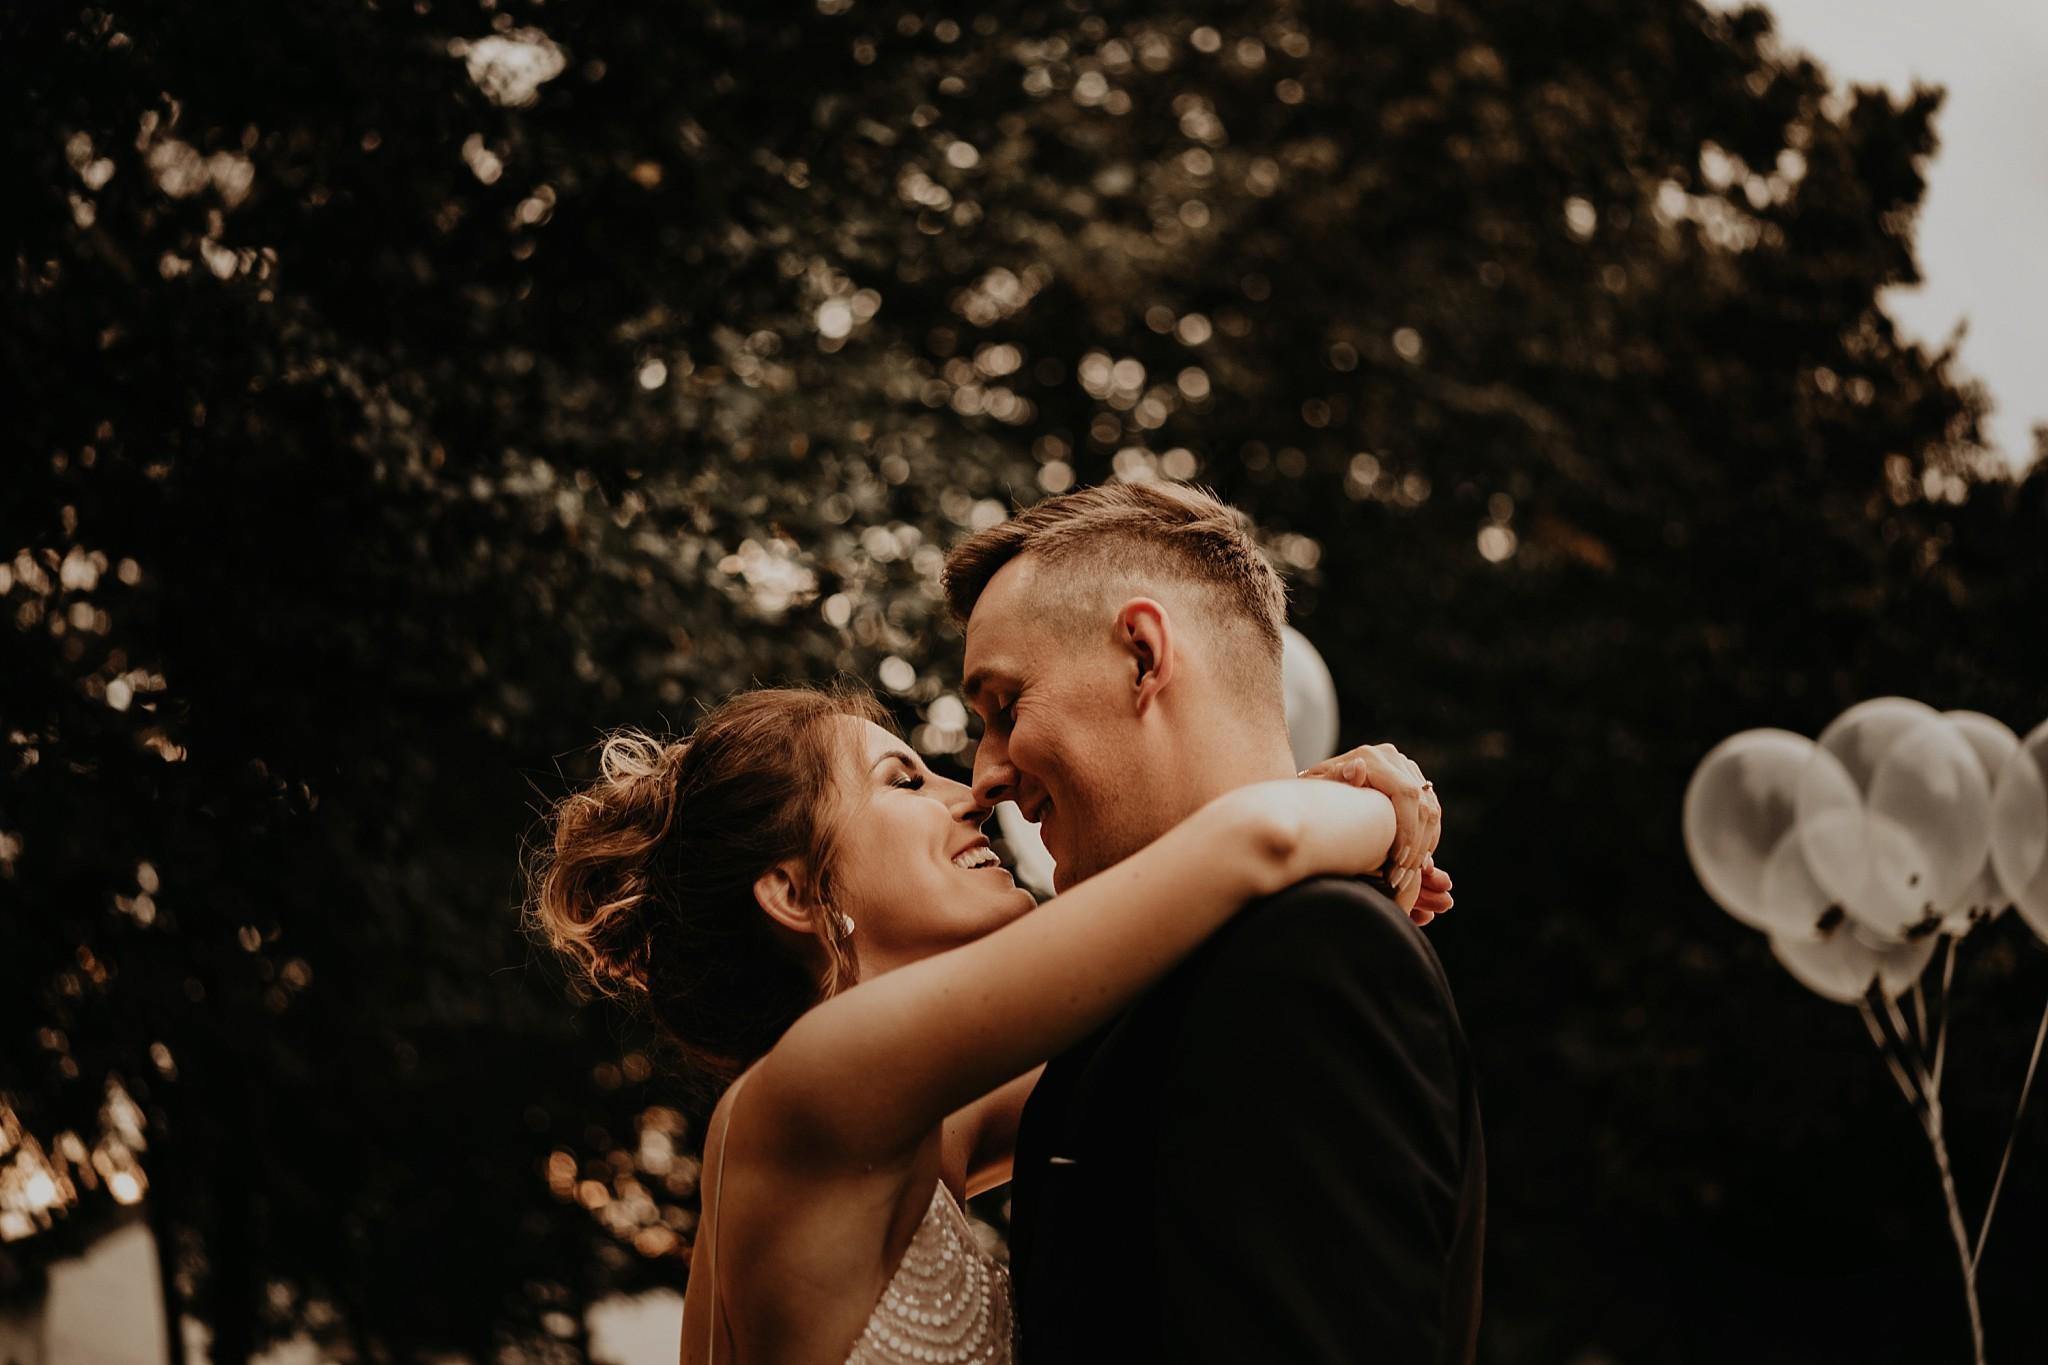 fotograf poznan wesele dobra truskawka piekne wesele pod poznaniem wesele w dobrej truskawce piekna para mloda slub marzen slub koronawirus slub listopad wesele koronawirus 345